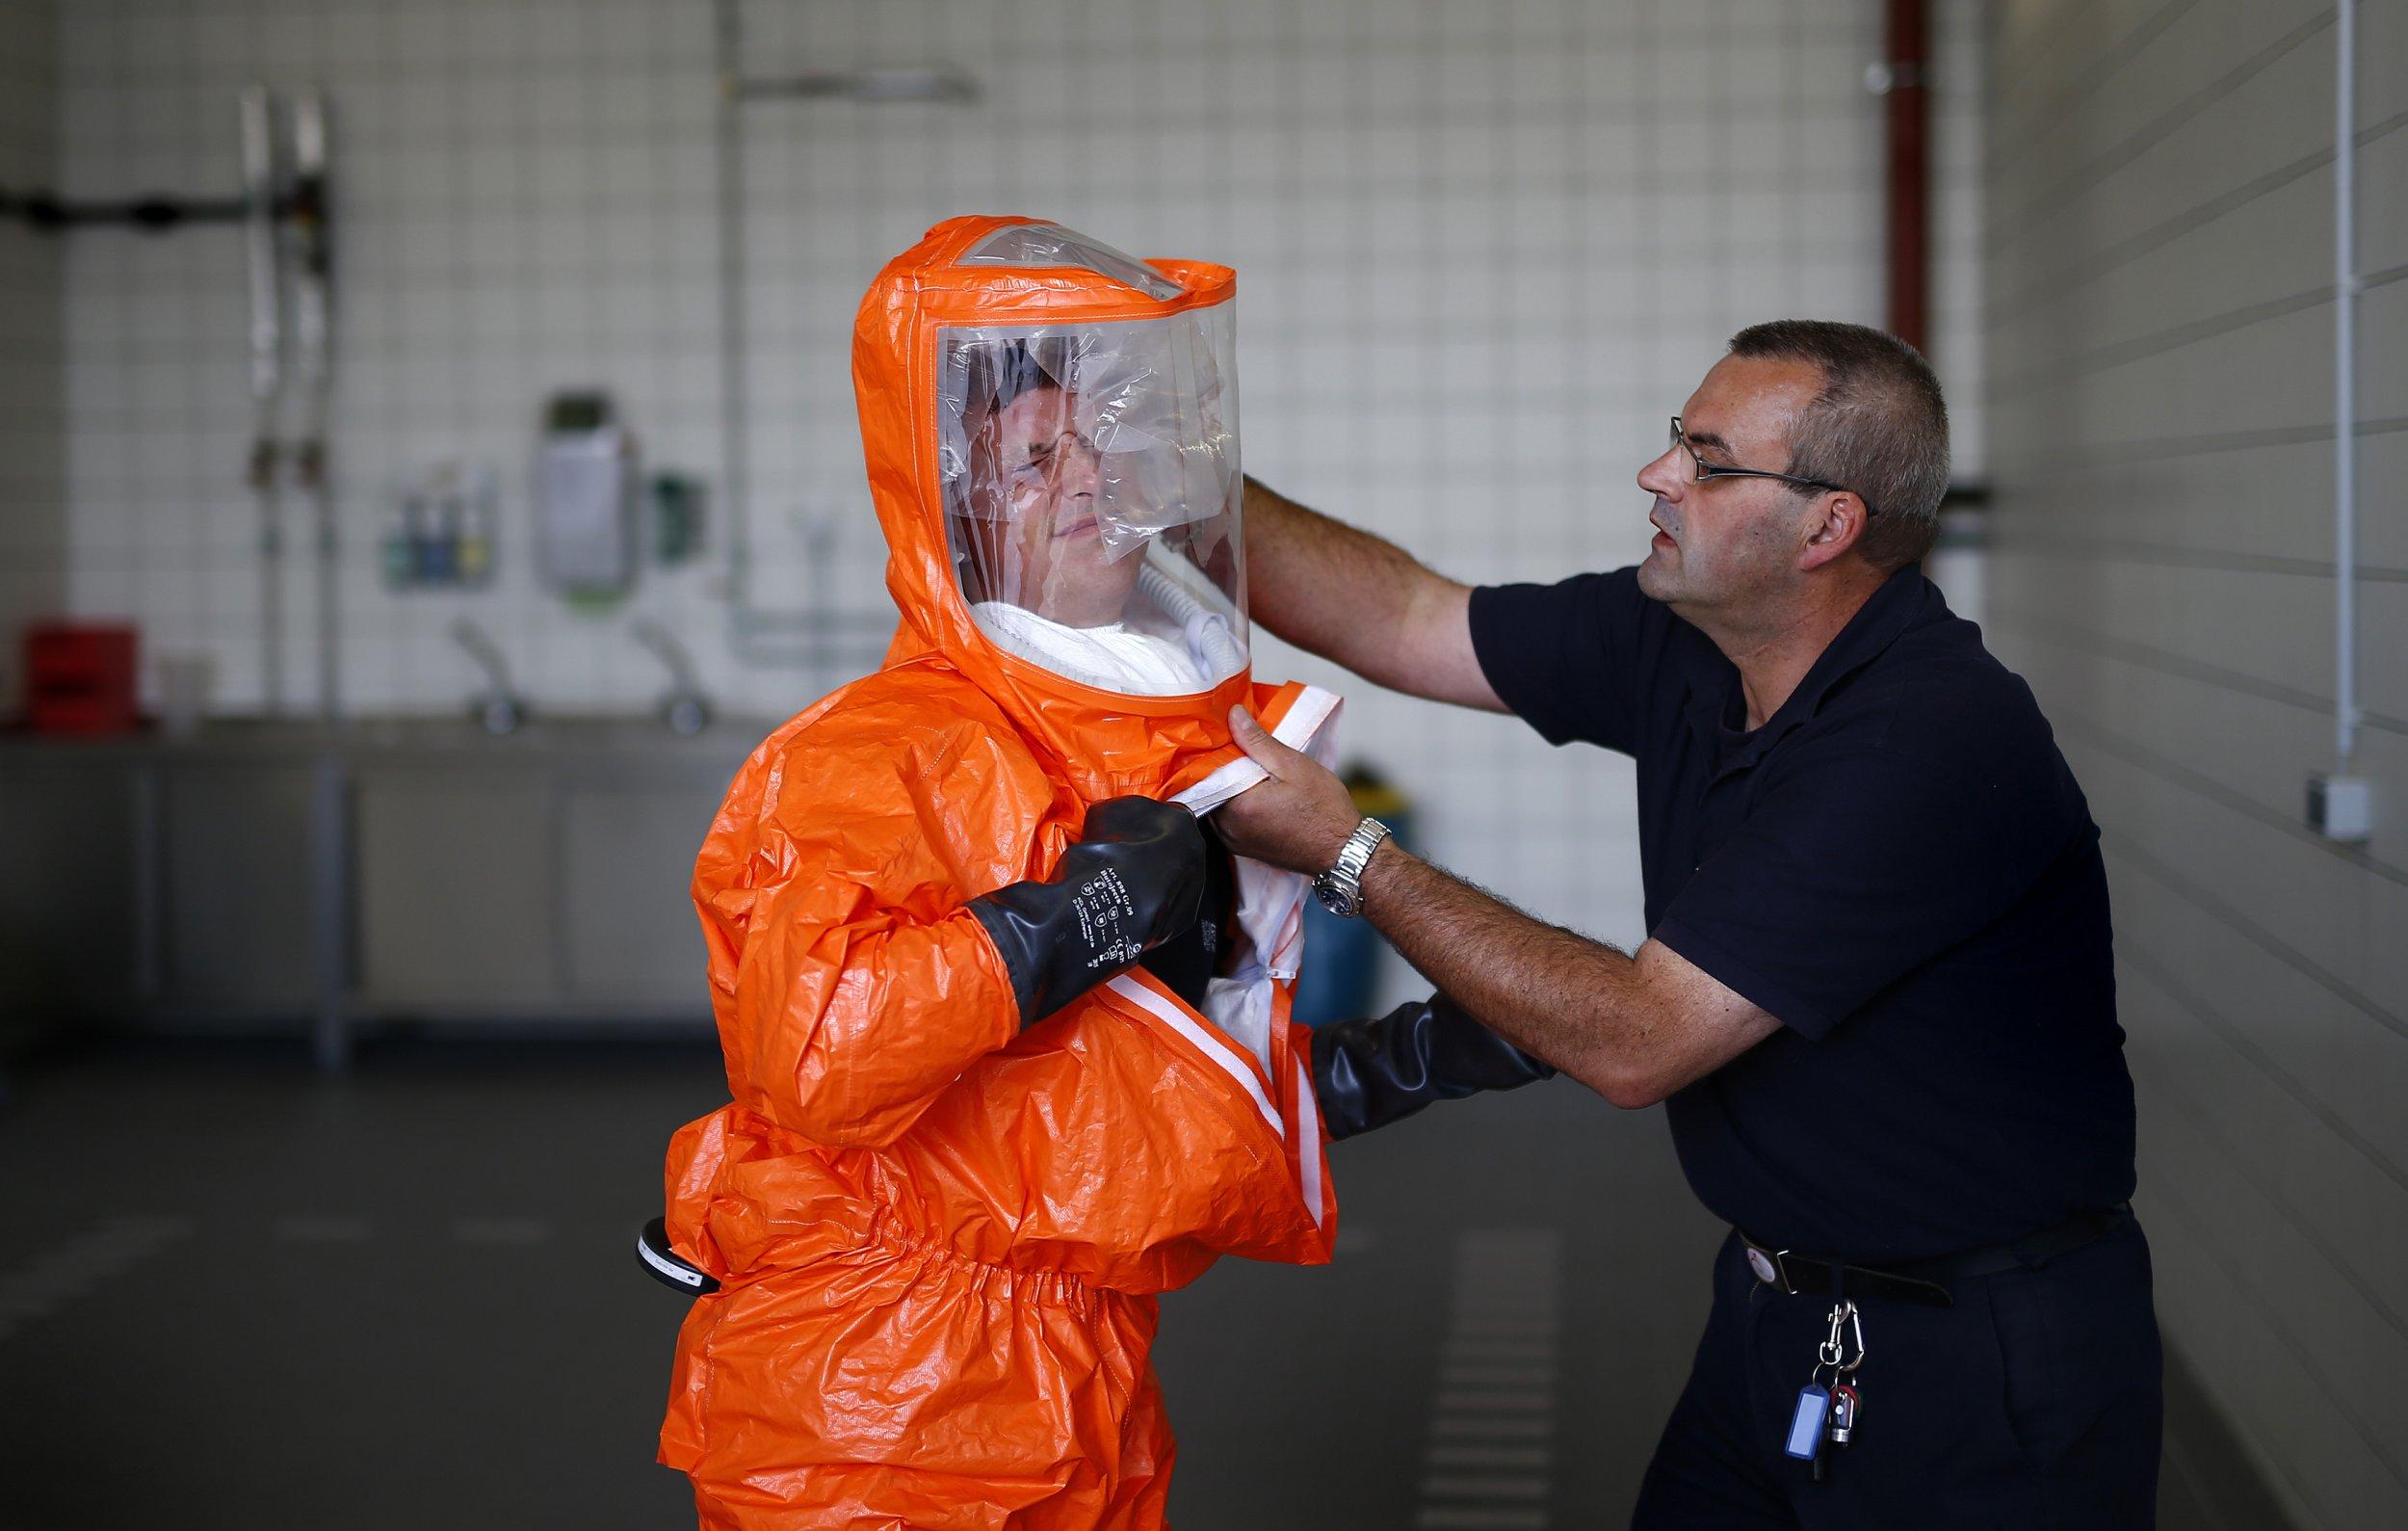 EbolaSuitGermany